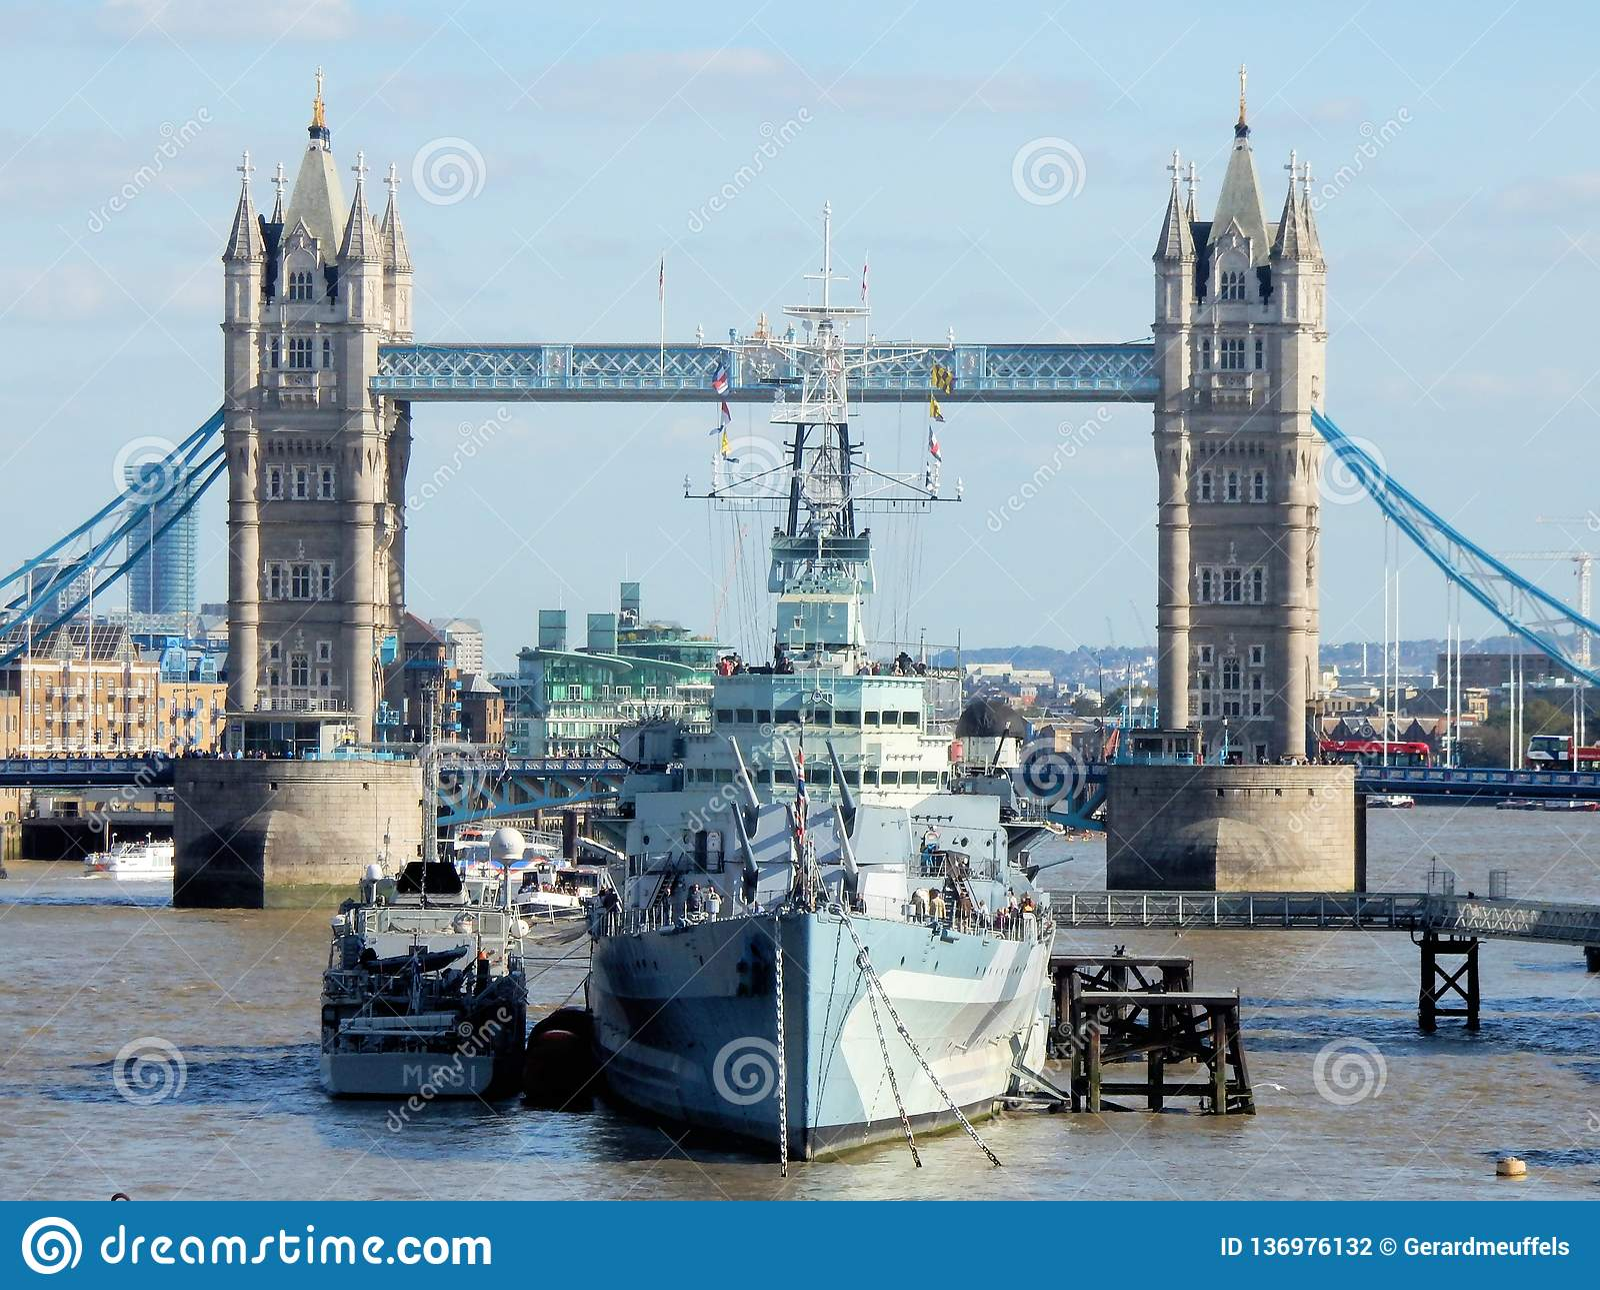 London, View from London Bridge on HMS Belfast and Tower Bridge